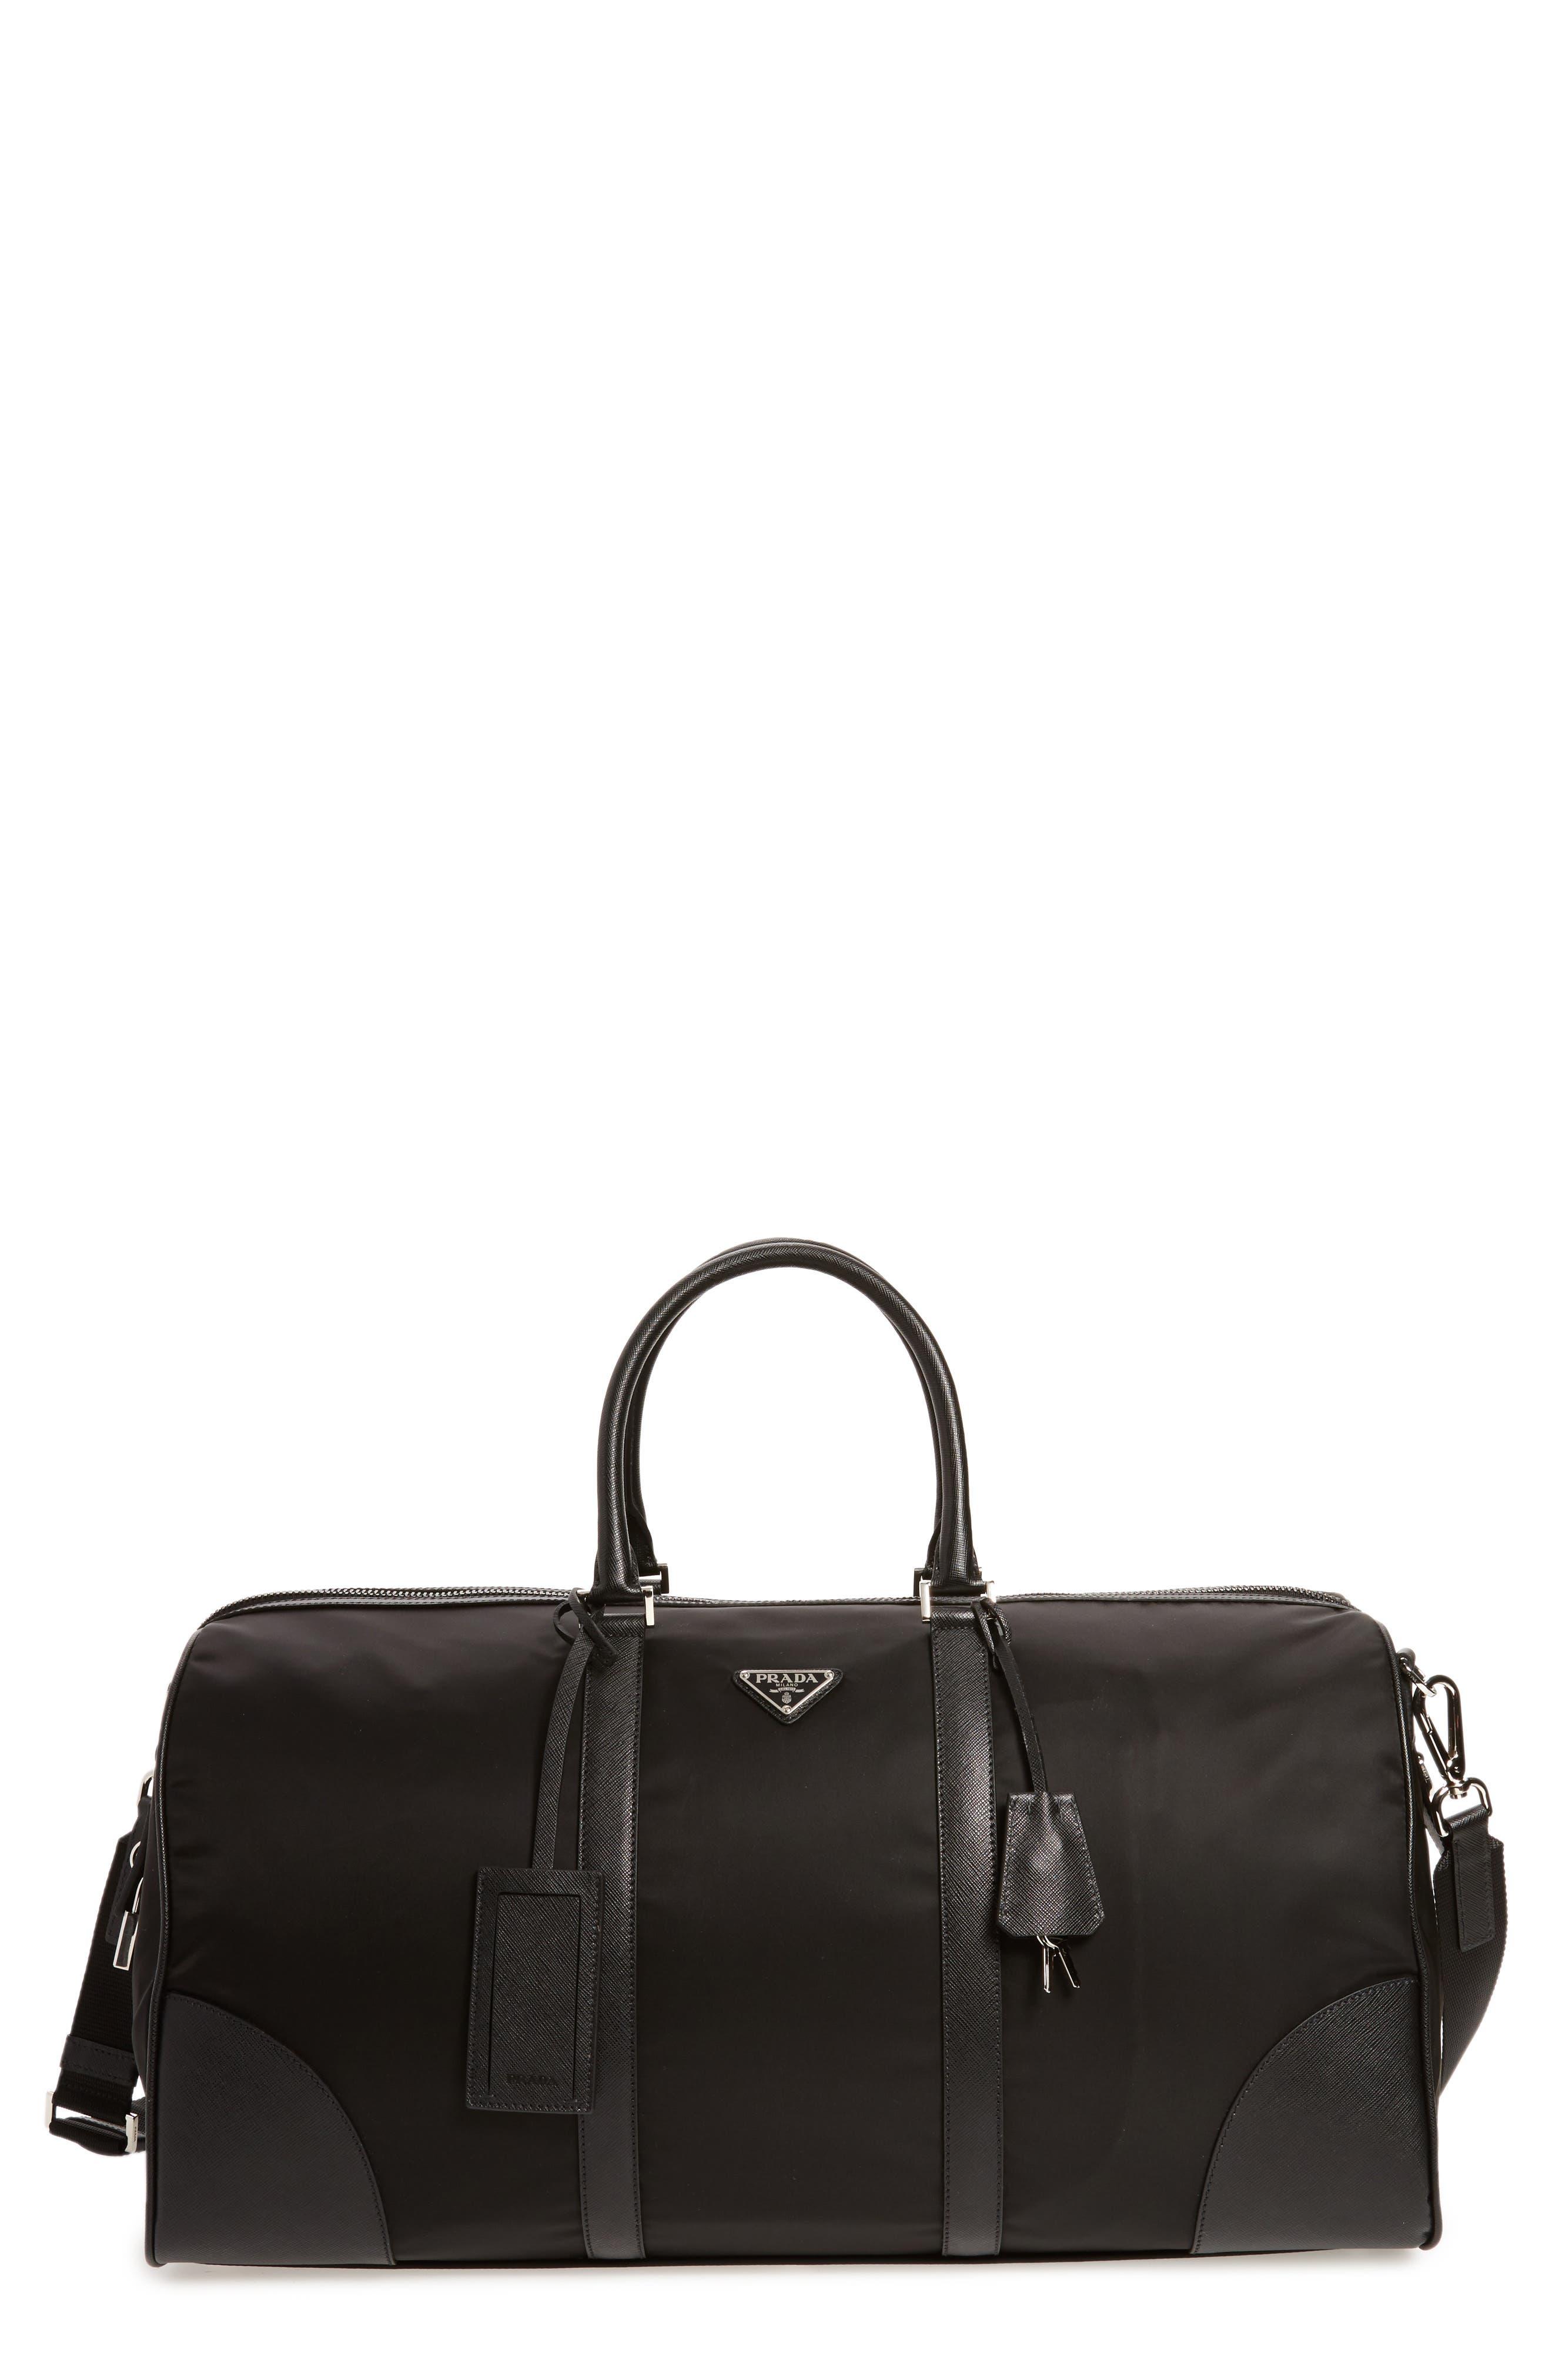 Alternate Image 1 Selected - Prada Nylon & Saffiano Leather Bowling Bag